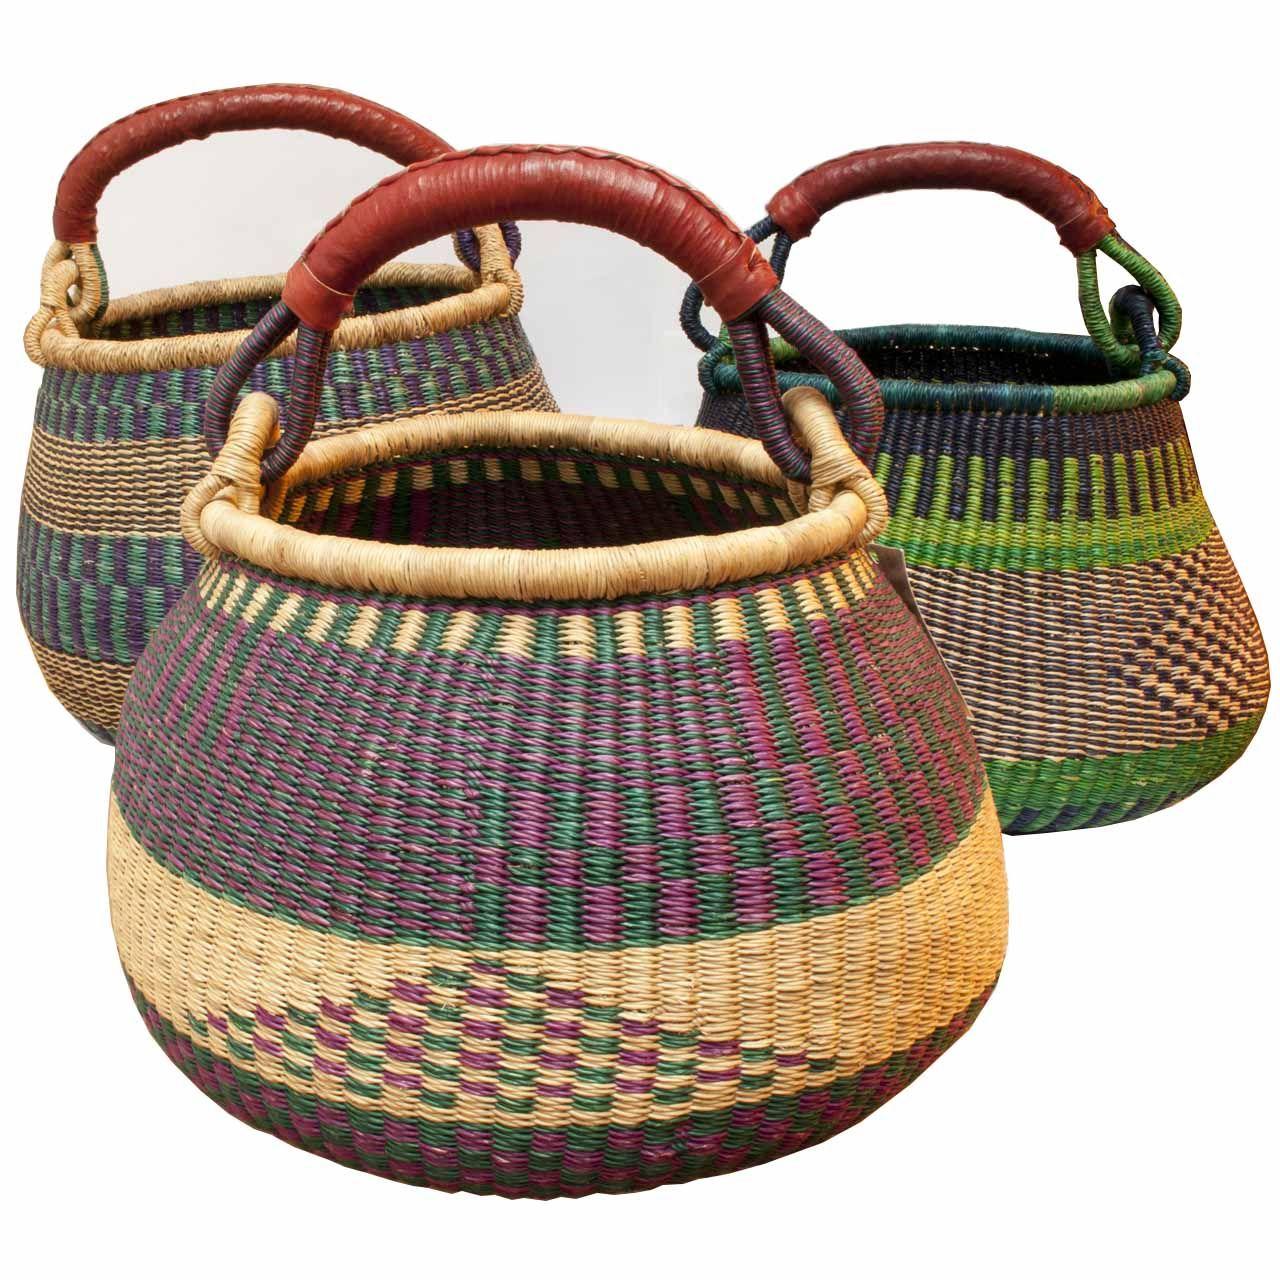 African Baskets: Bolga Basket, Gambibgo Pot With Goatskin Handle